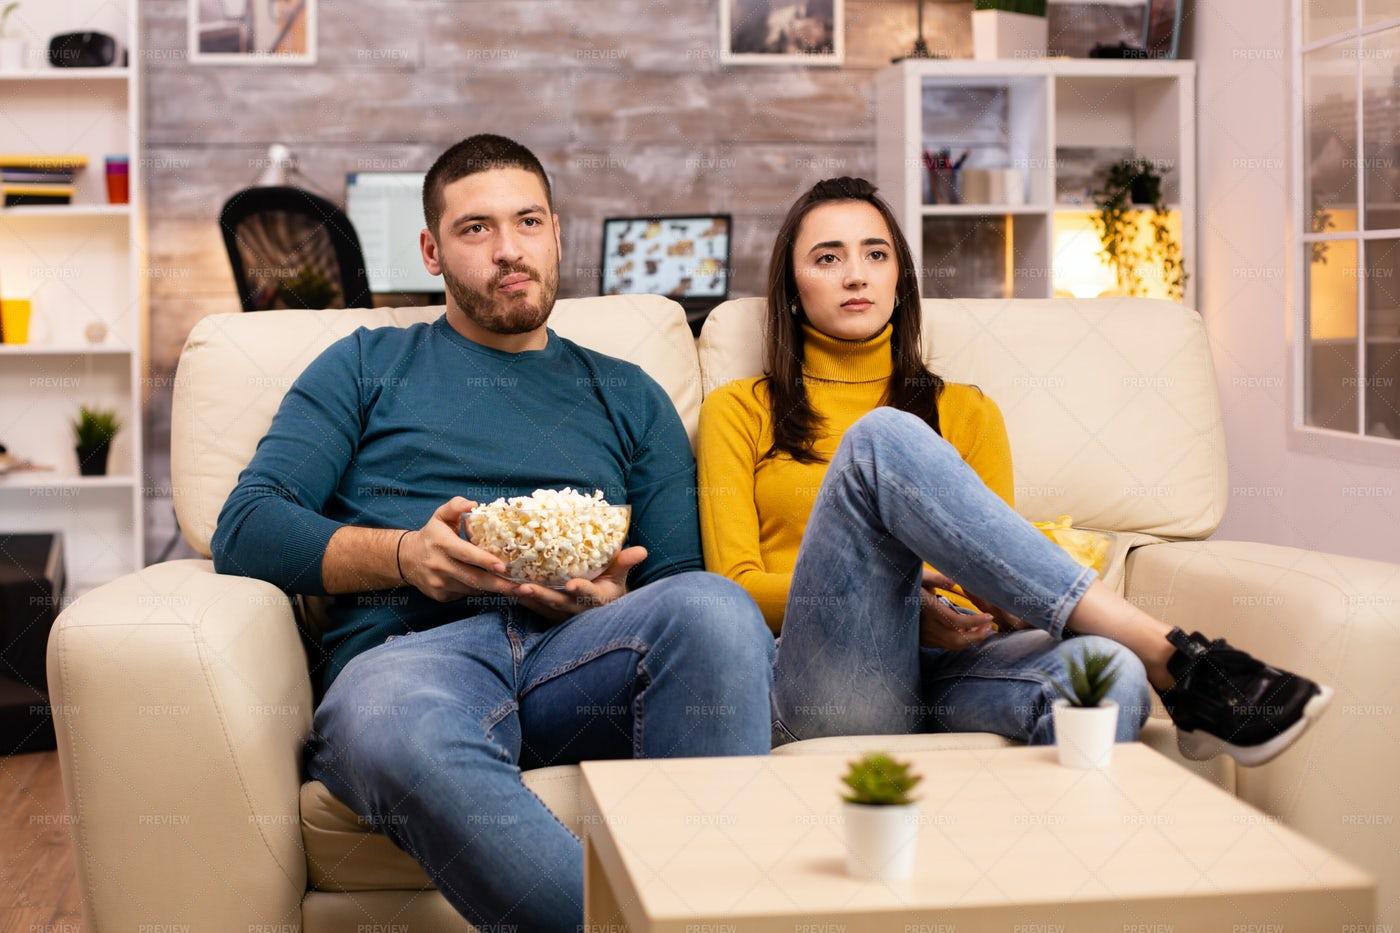 Popcorn And A Movie: Stock Photos